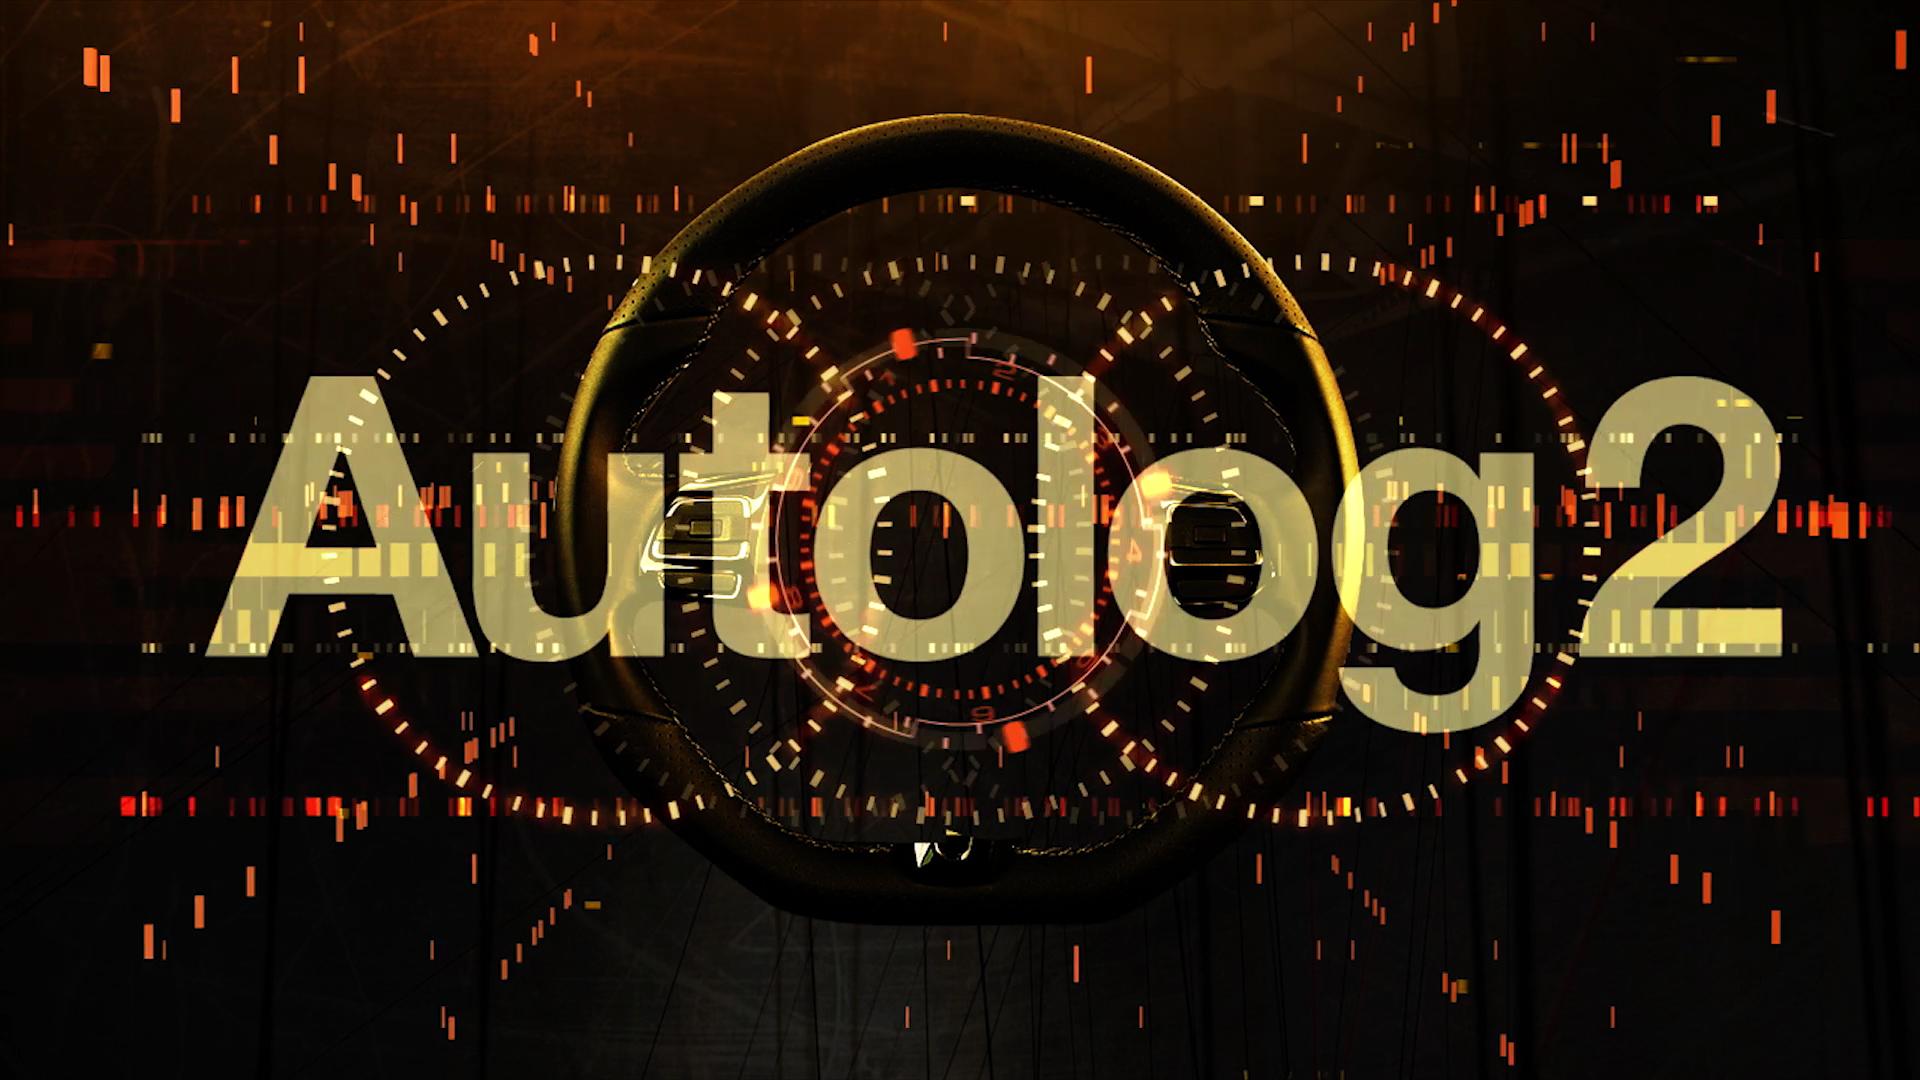 AutoLog.02